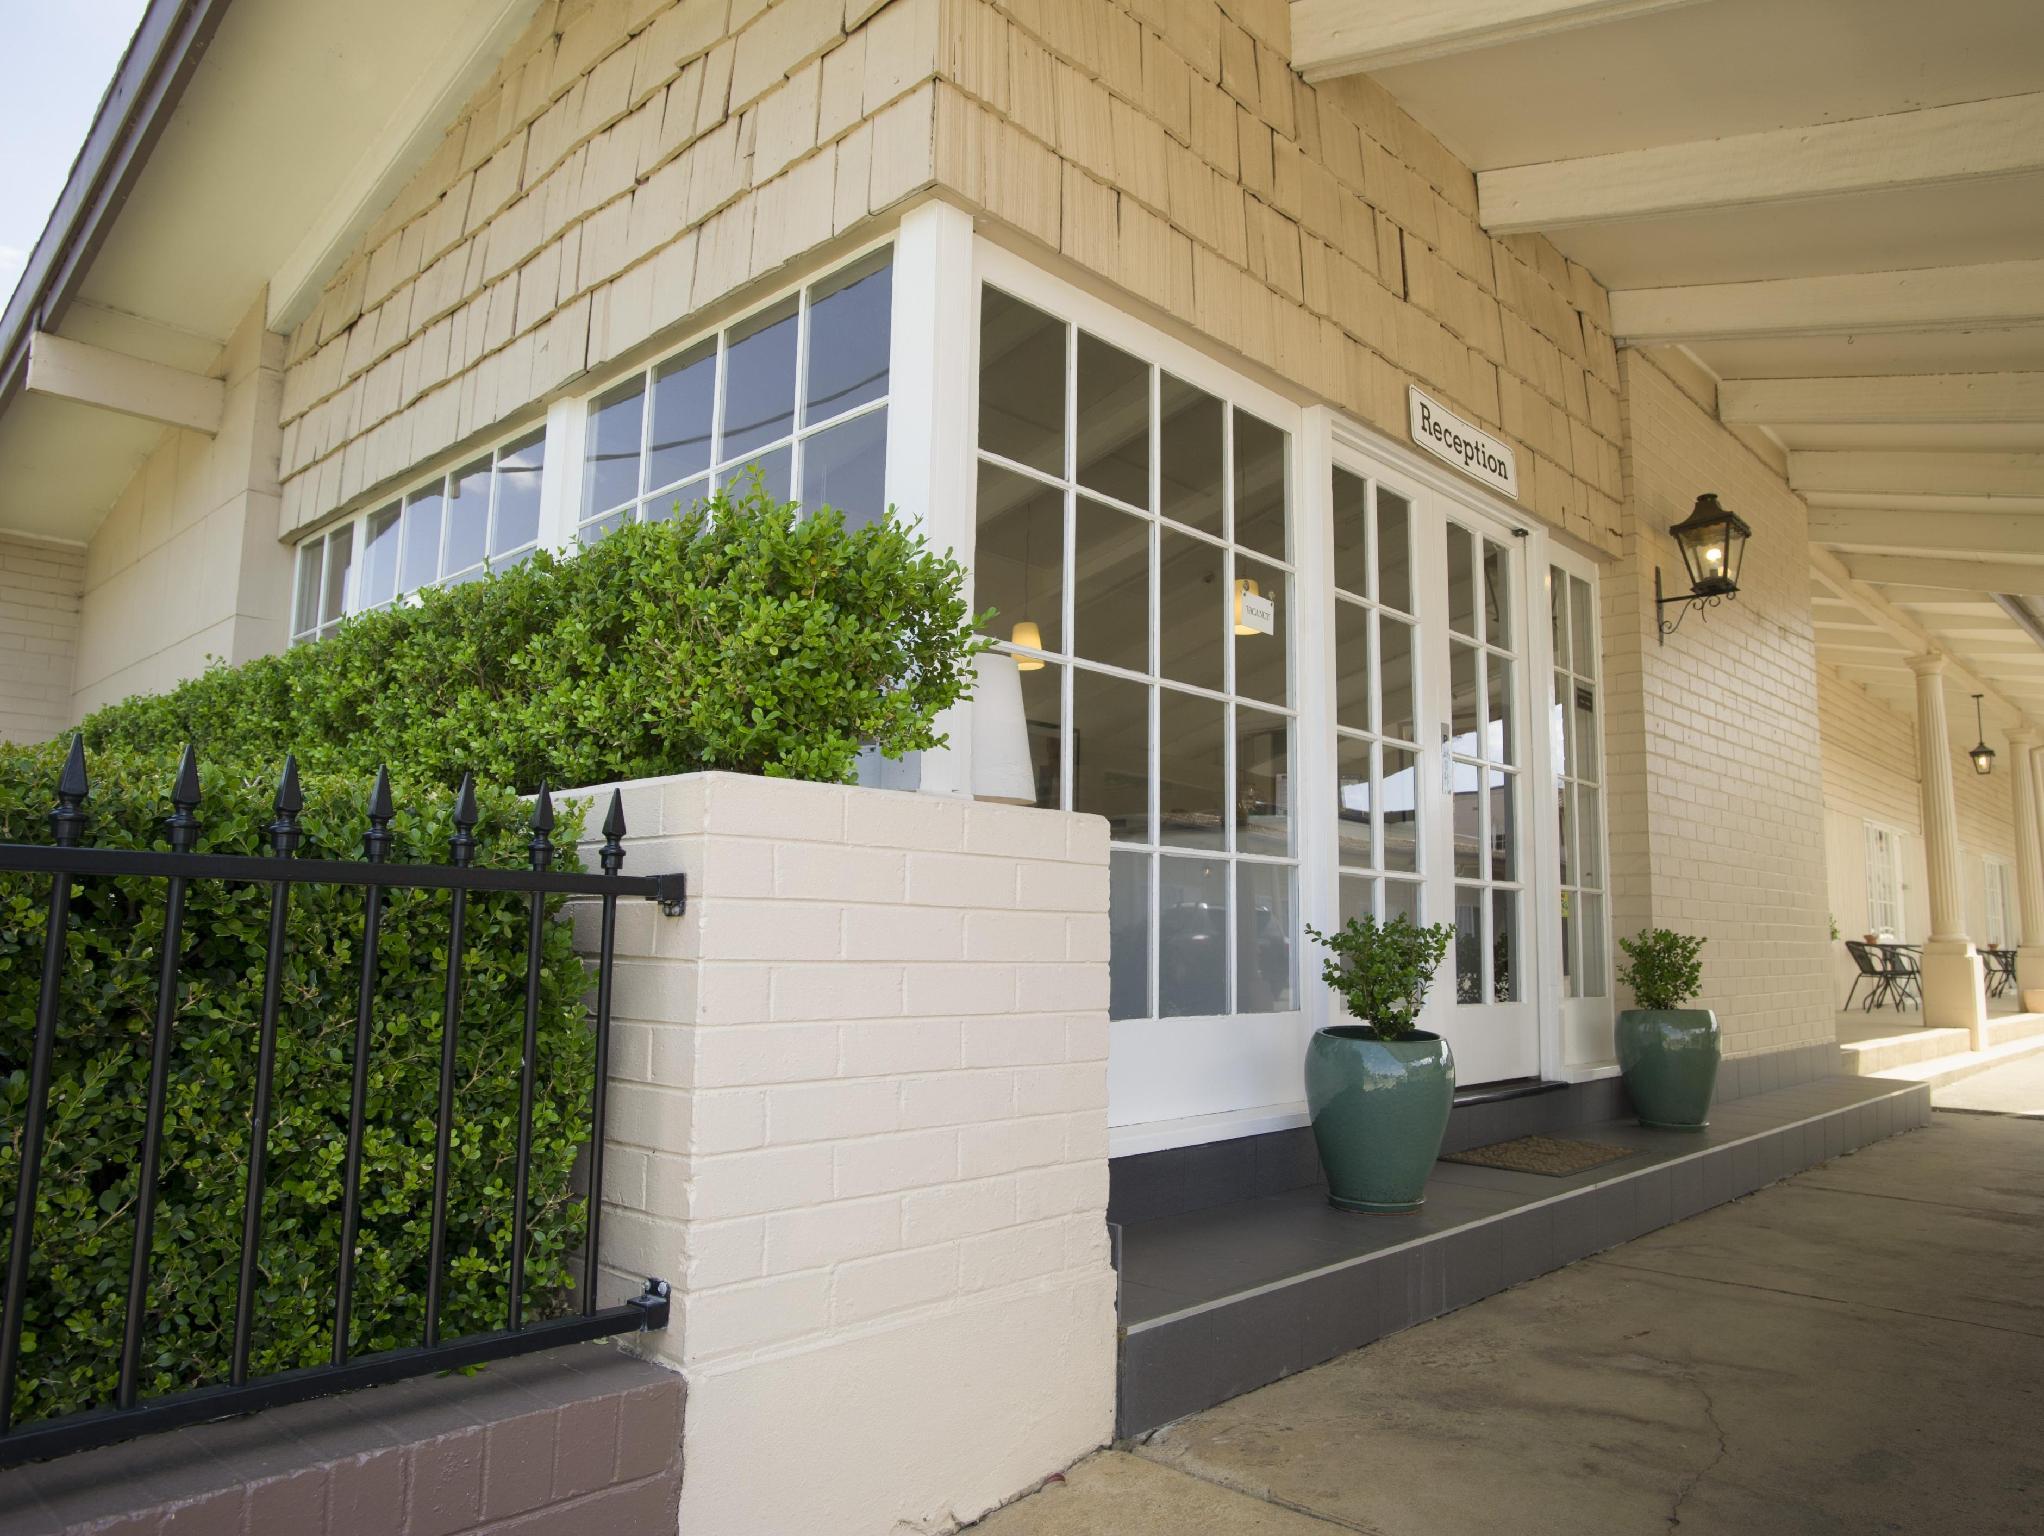 Club Motel and Apartments, Wagga Wagga - Pt A